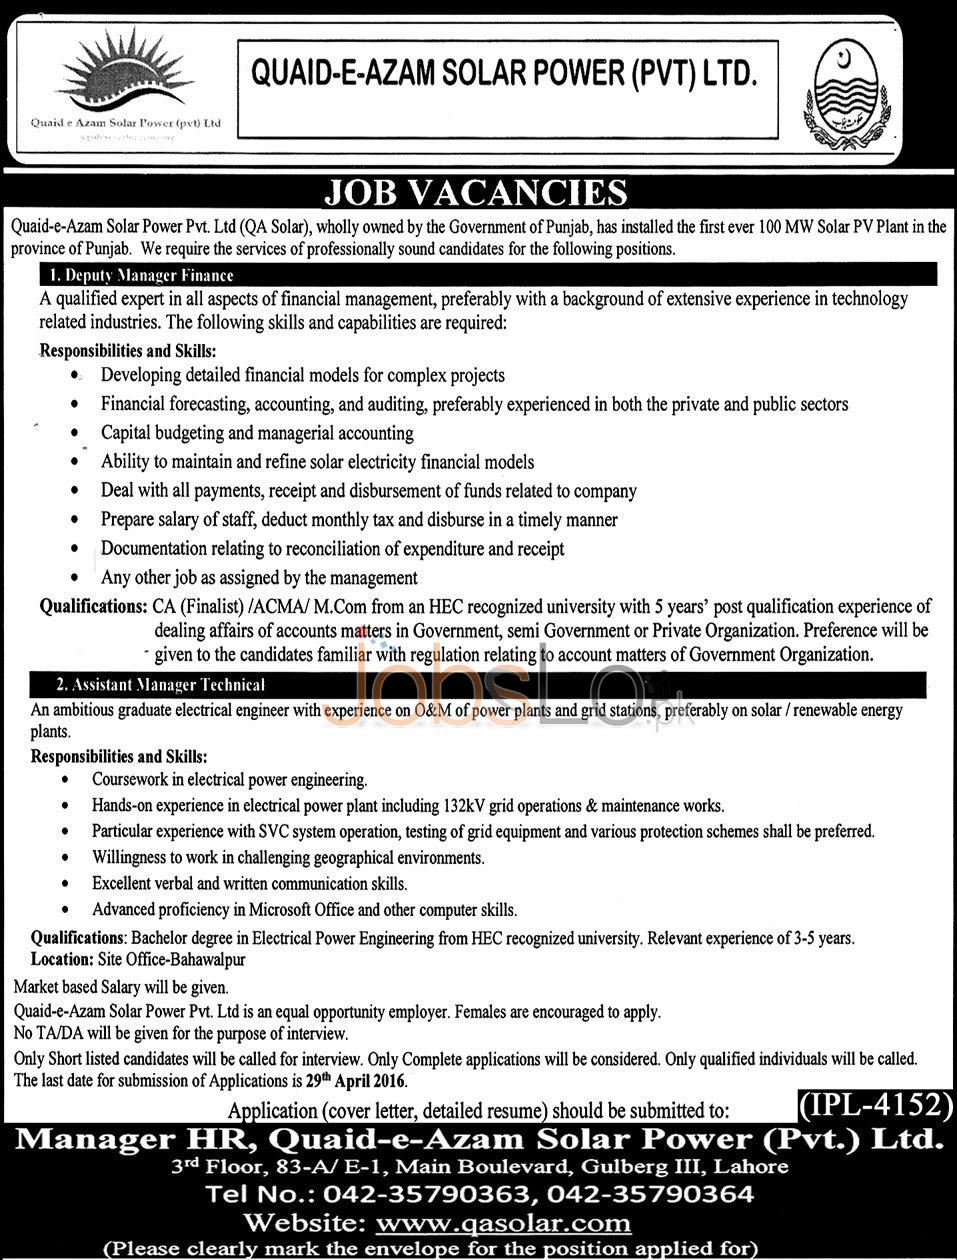 Quaid-e-Azam Solar Power Pvt Ltd Jobs